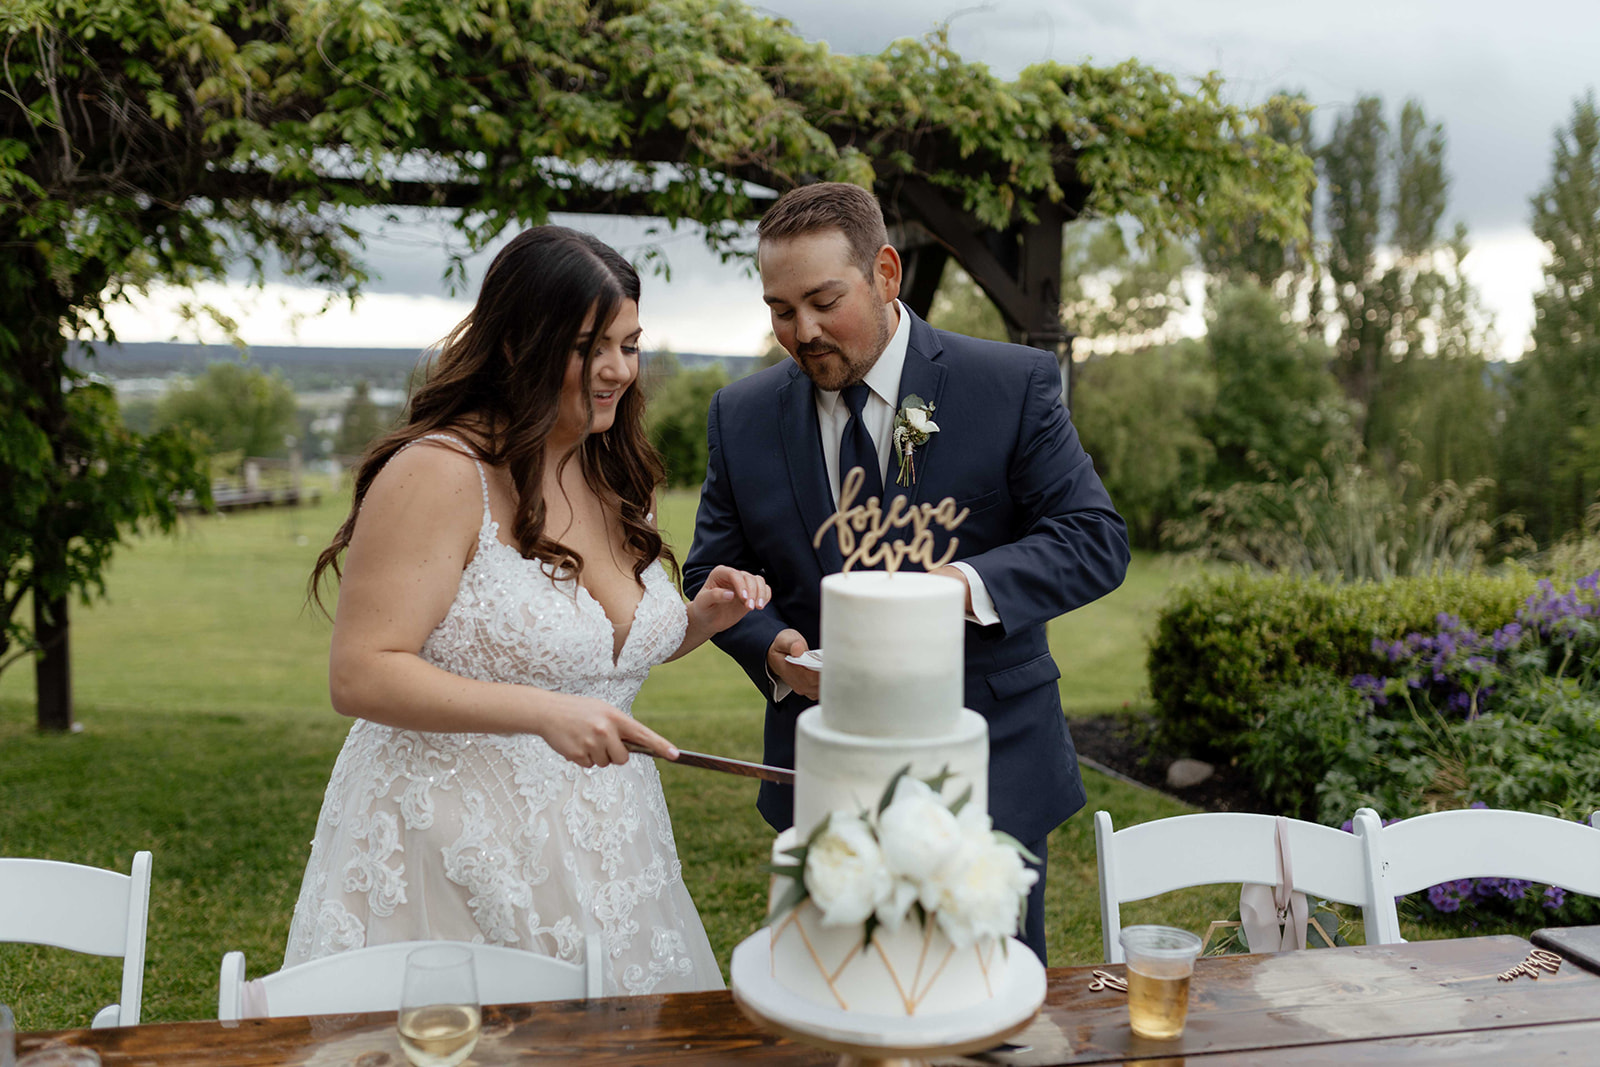 beacon hill wedding honest in ivory dress spokane cake cutting